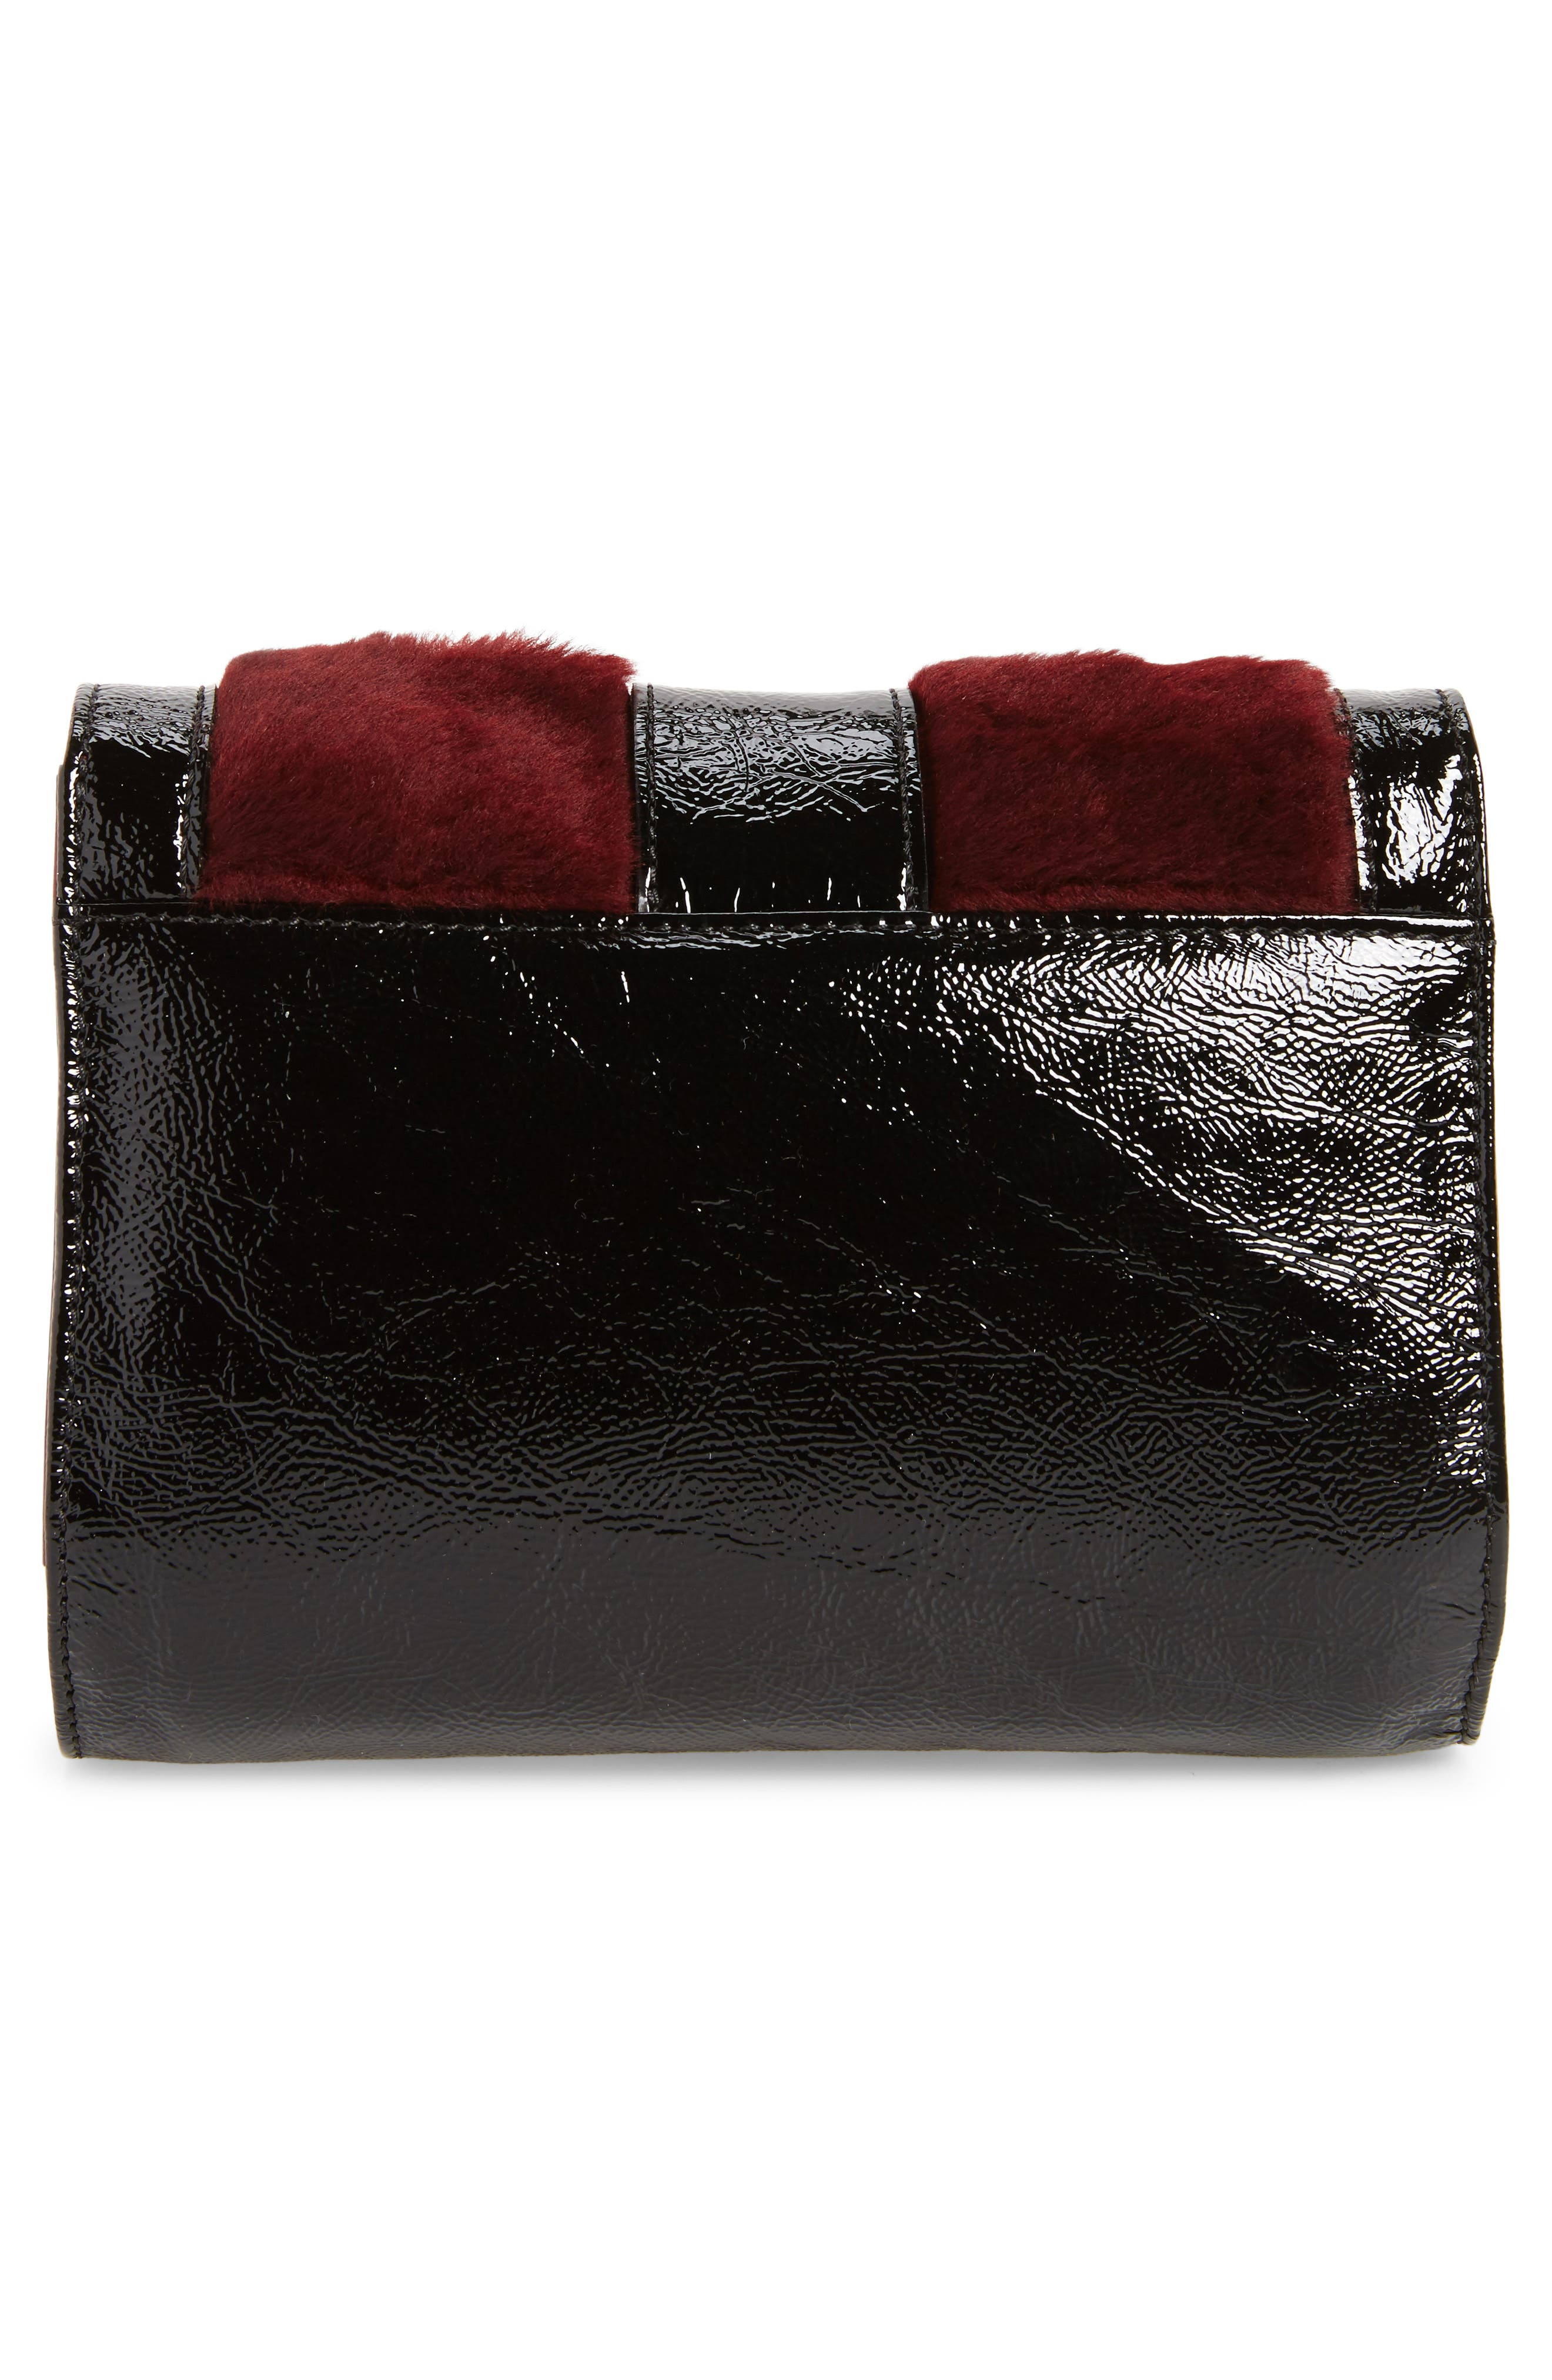 La Baronne Genuine Shearling Trim Leather Clutch,                             Alternate thumbnail 3, color,